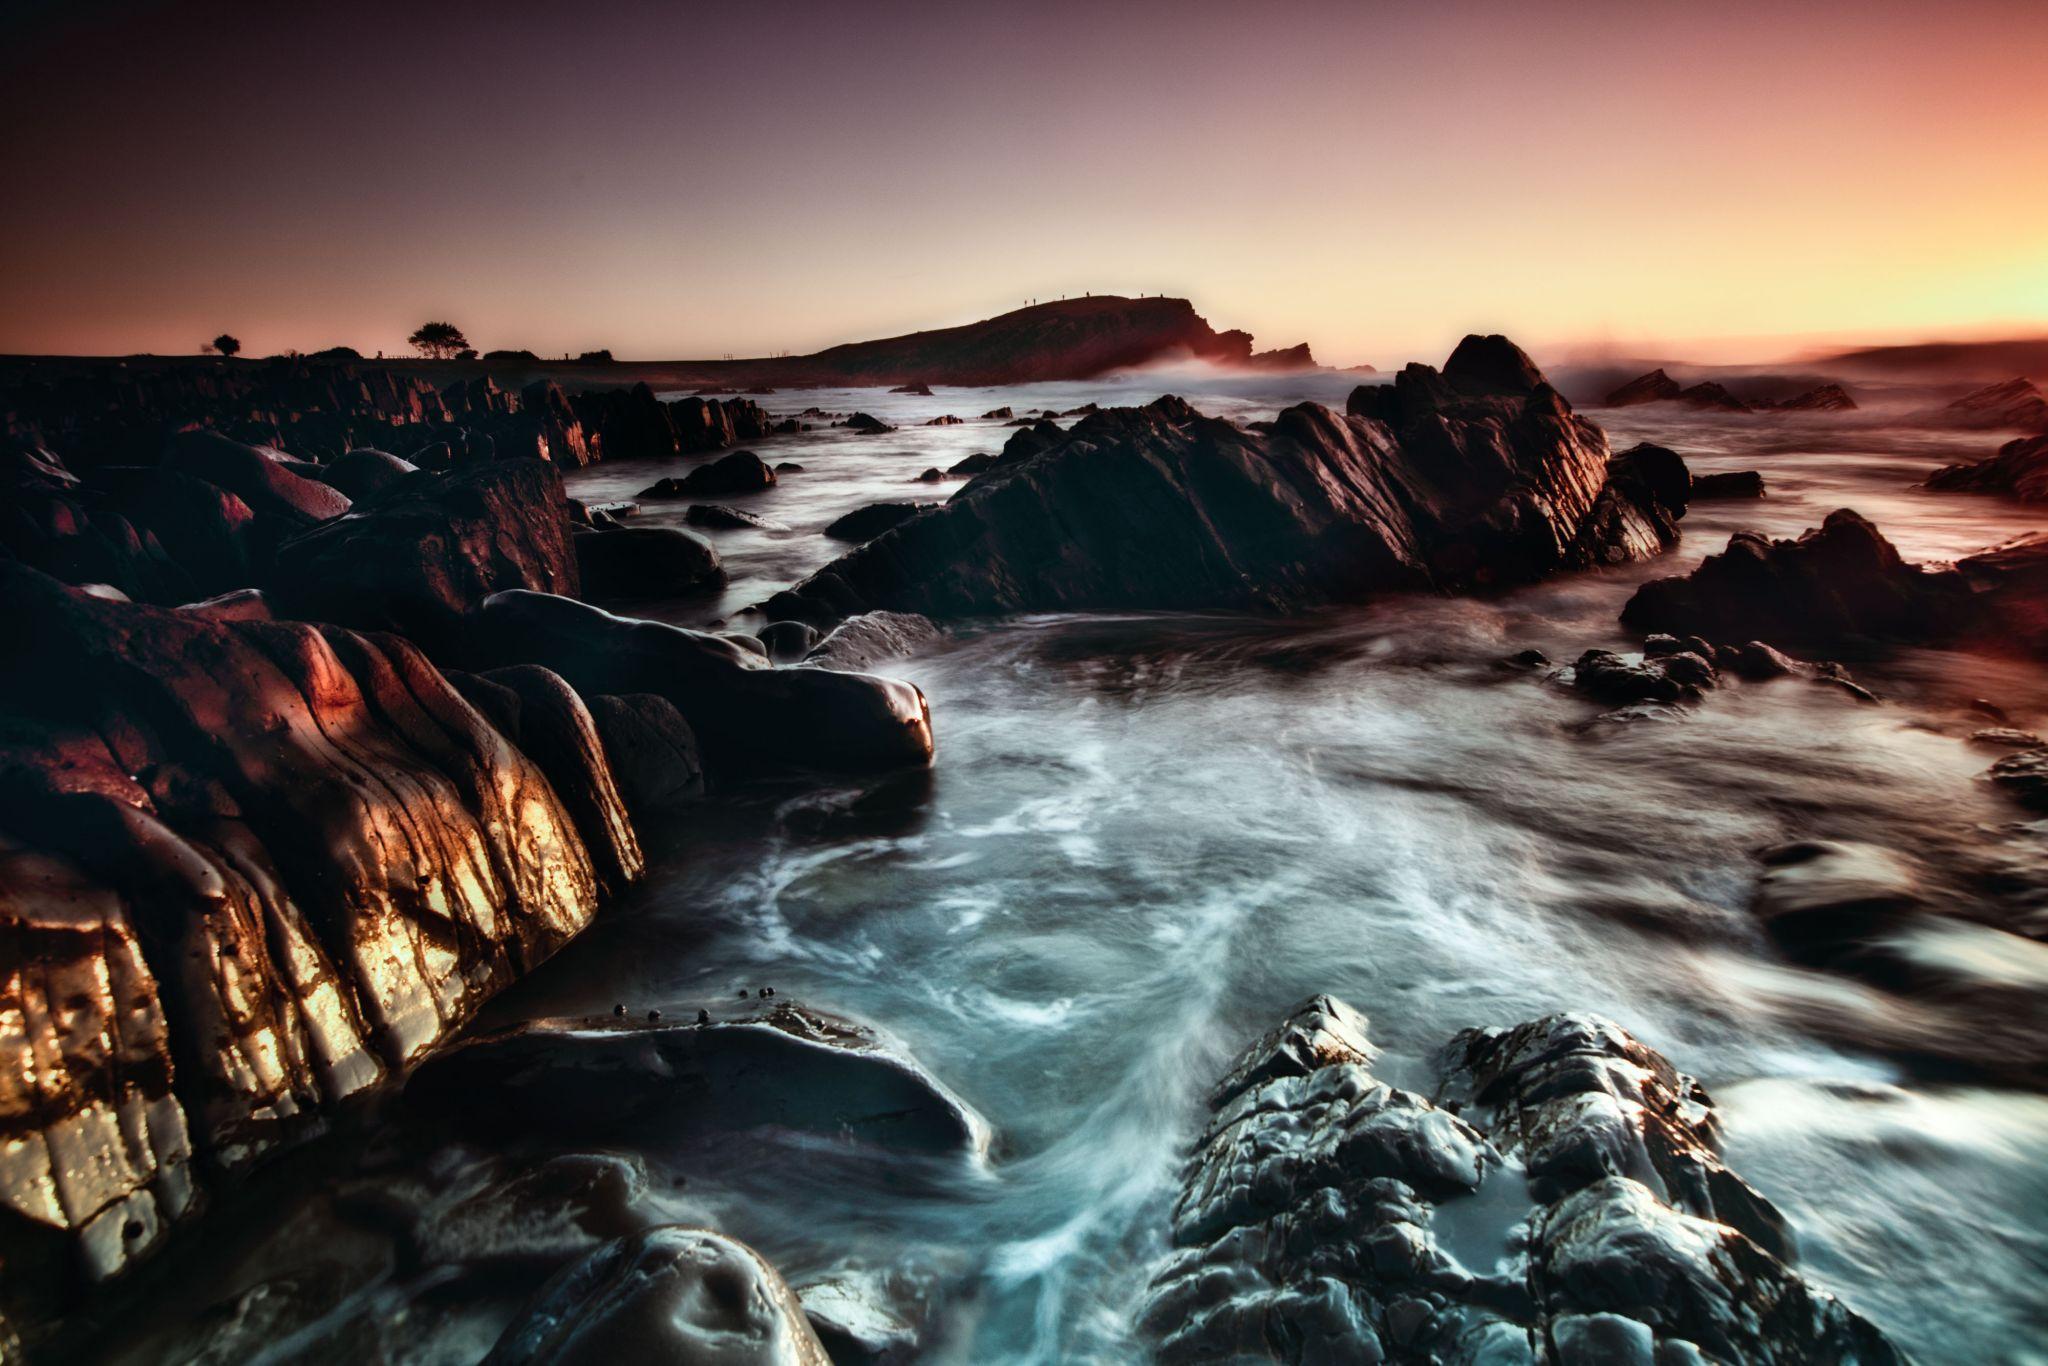 Tide receding Little Nobby Crescent Head NSW, Australia